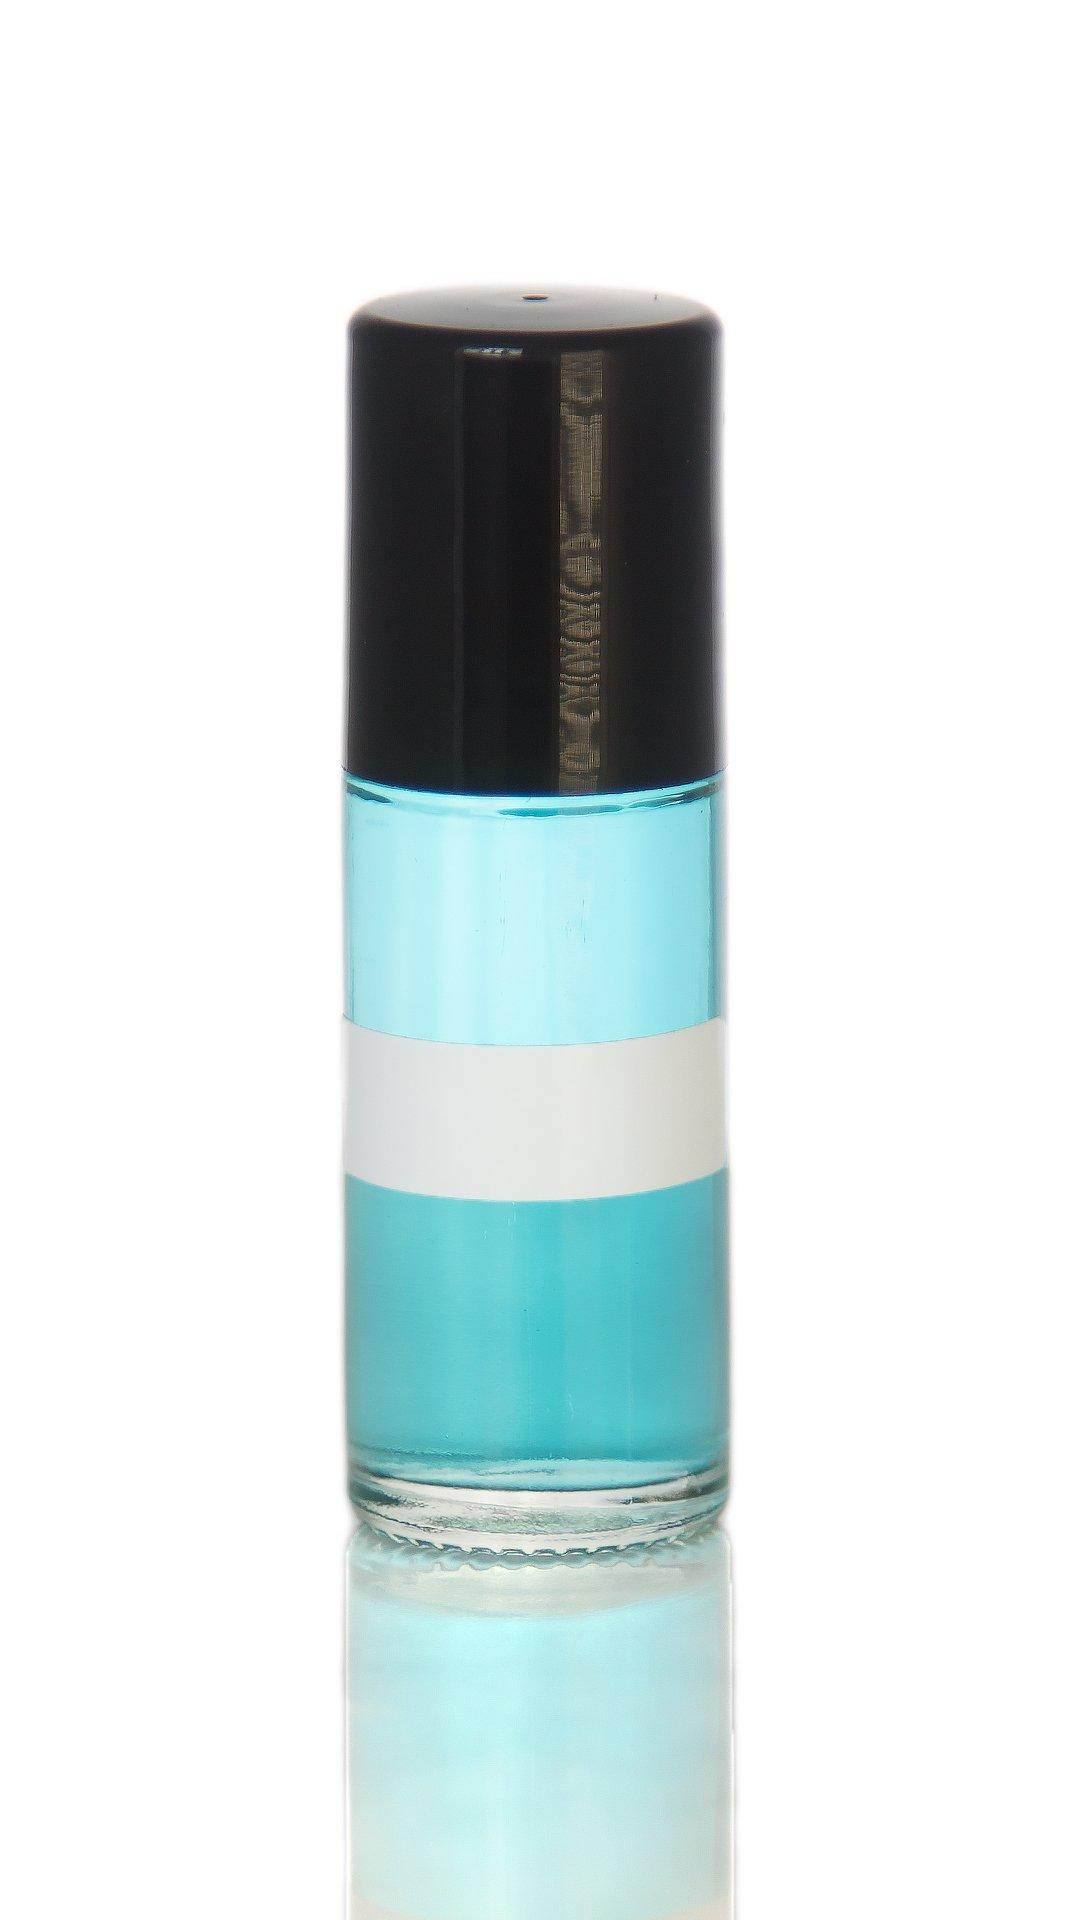 FragranceBodyOilz Impression of Light Blue By Dolce & Gabbana (Roll On) for Women Premium Hypoallergenic Perfume Body Oil, Affordable Generic Version … (1 OZ)